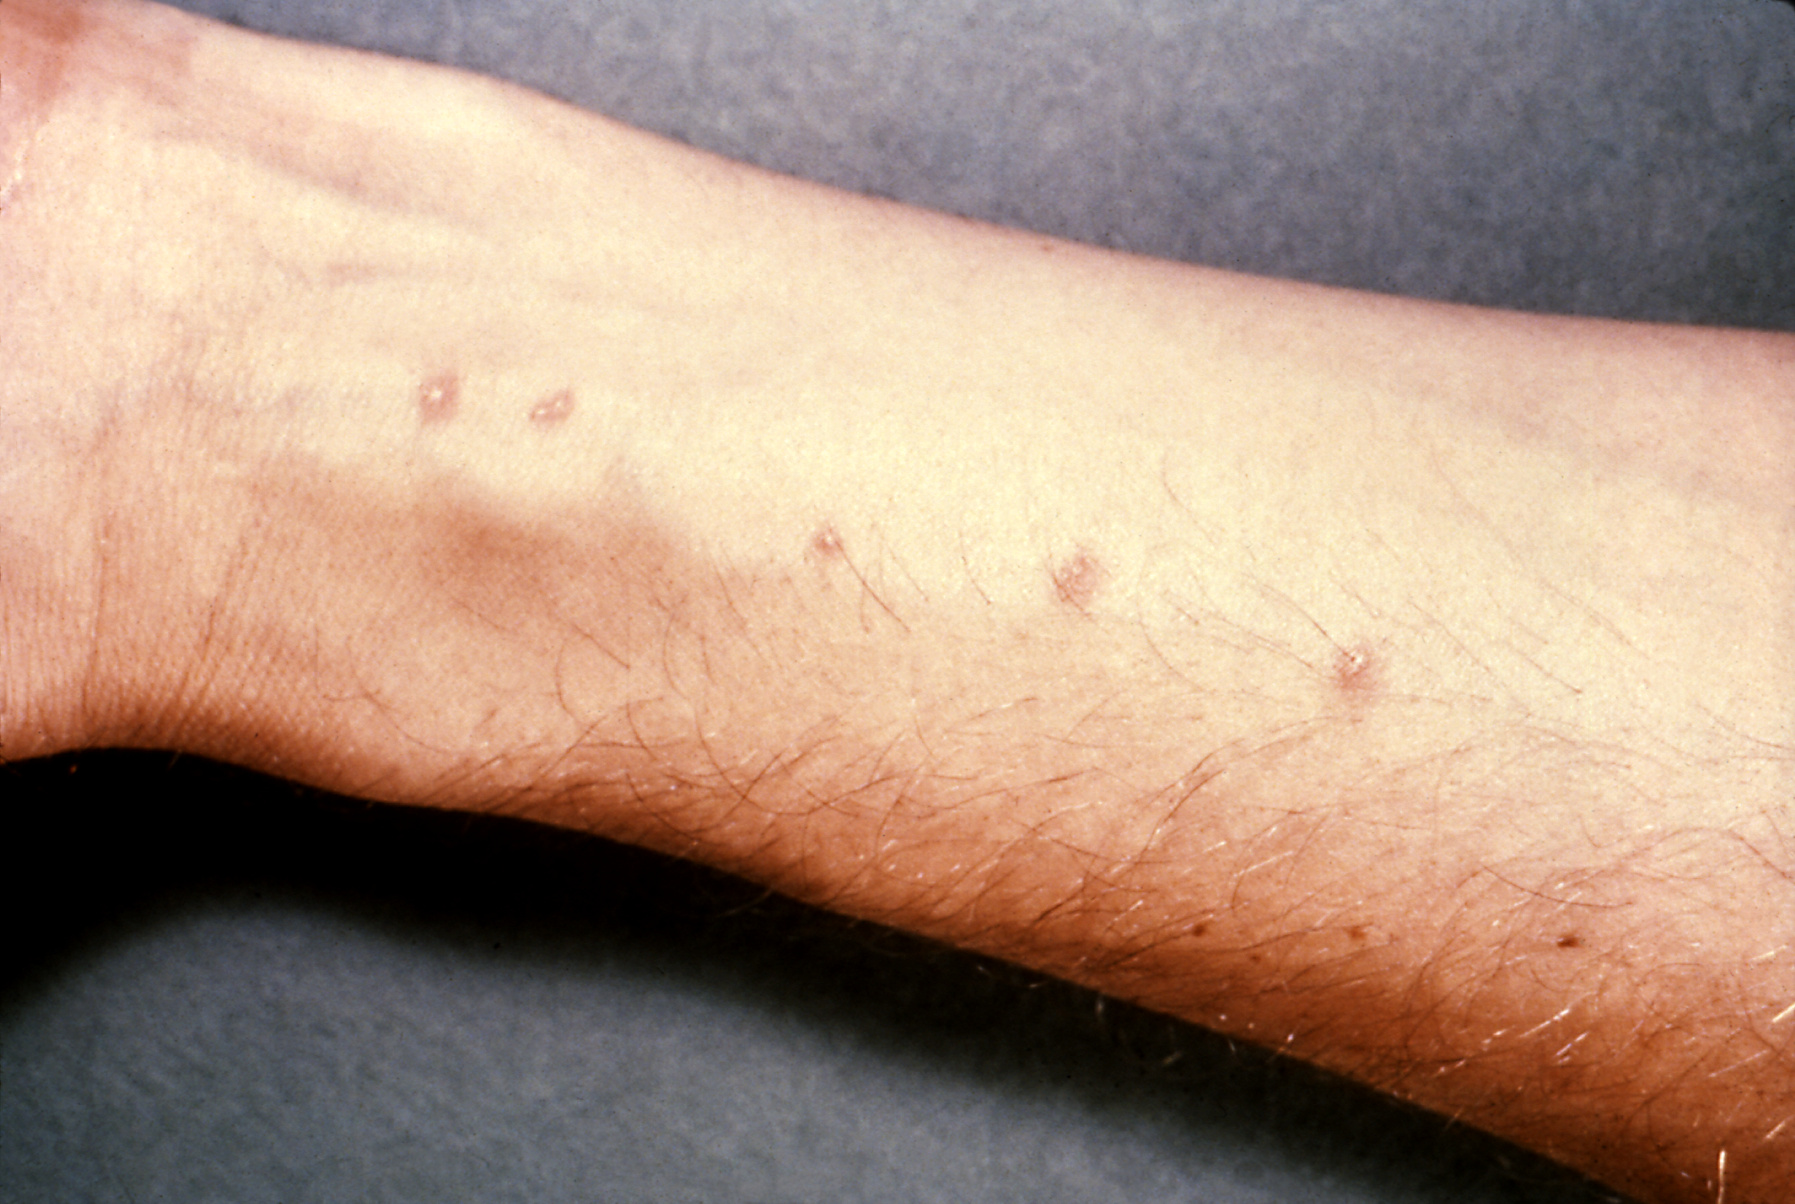 giardia symptoms rash)